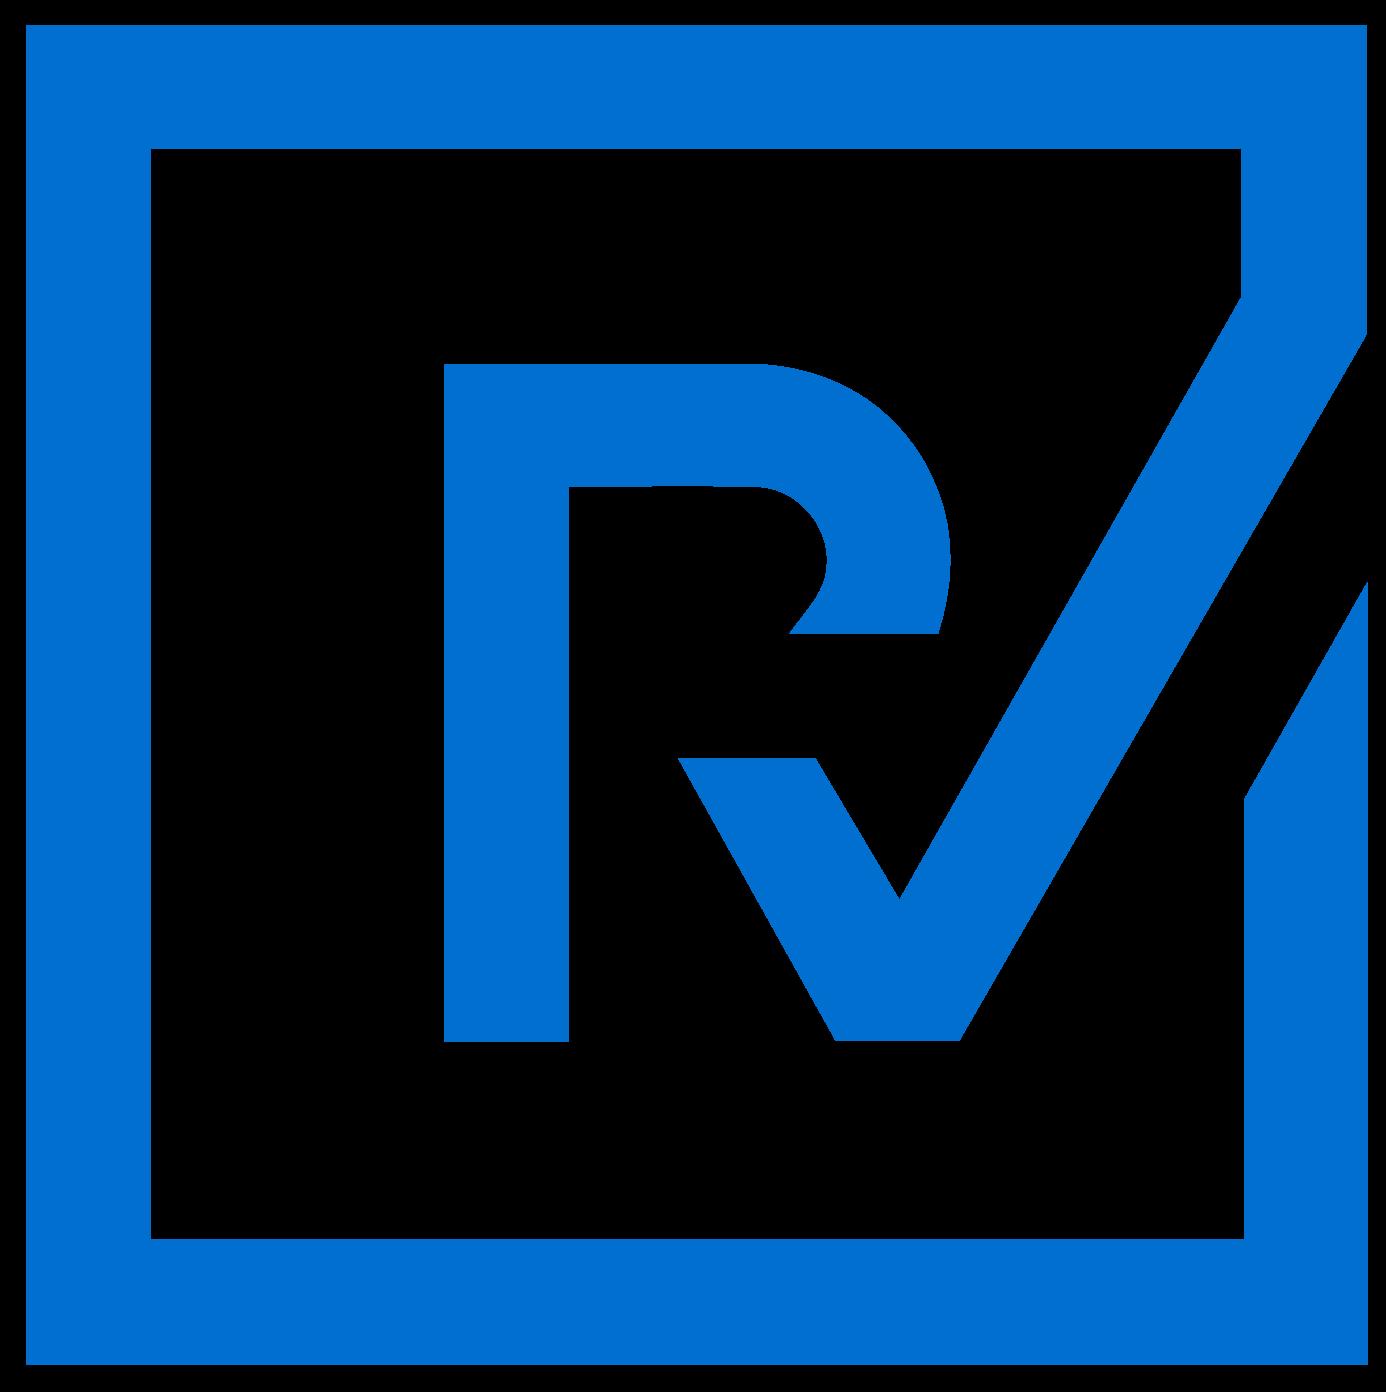 www.regxsa.com